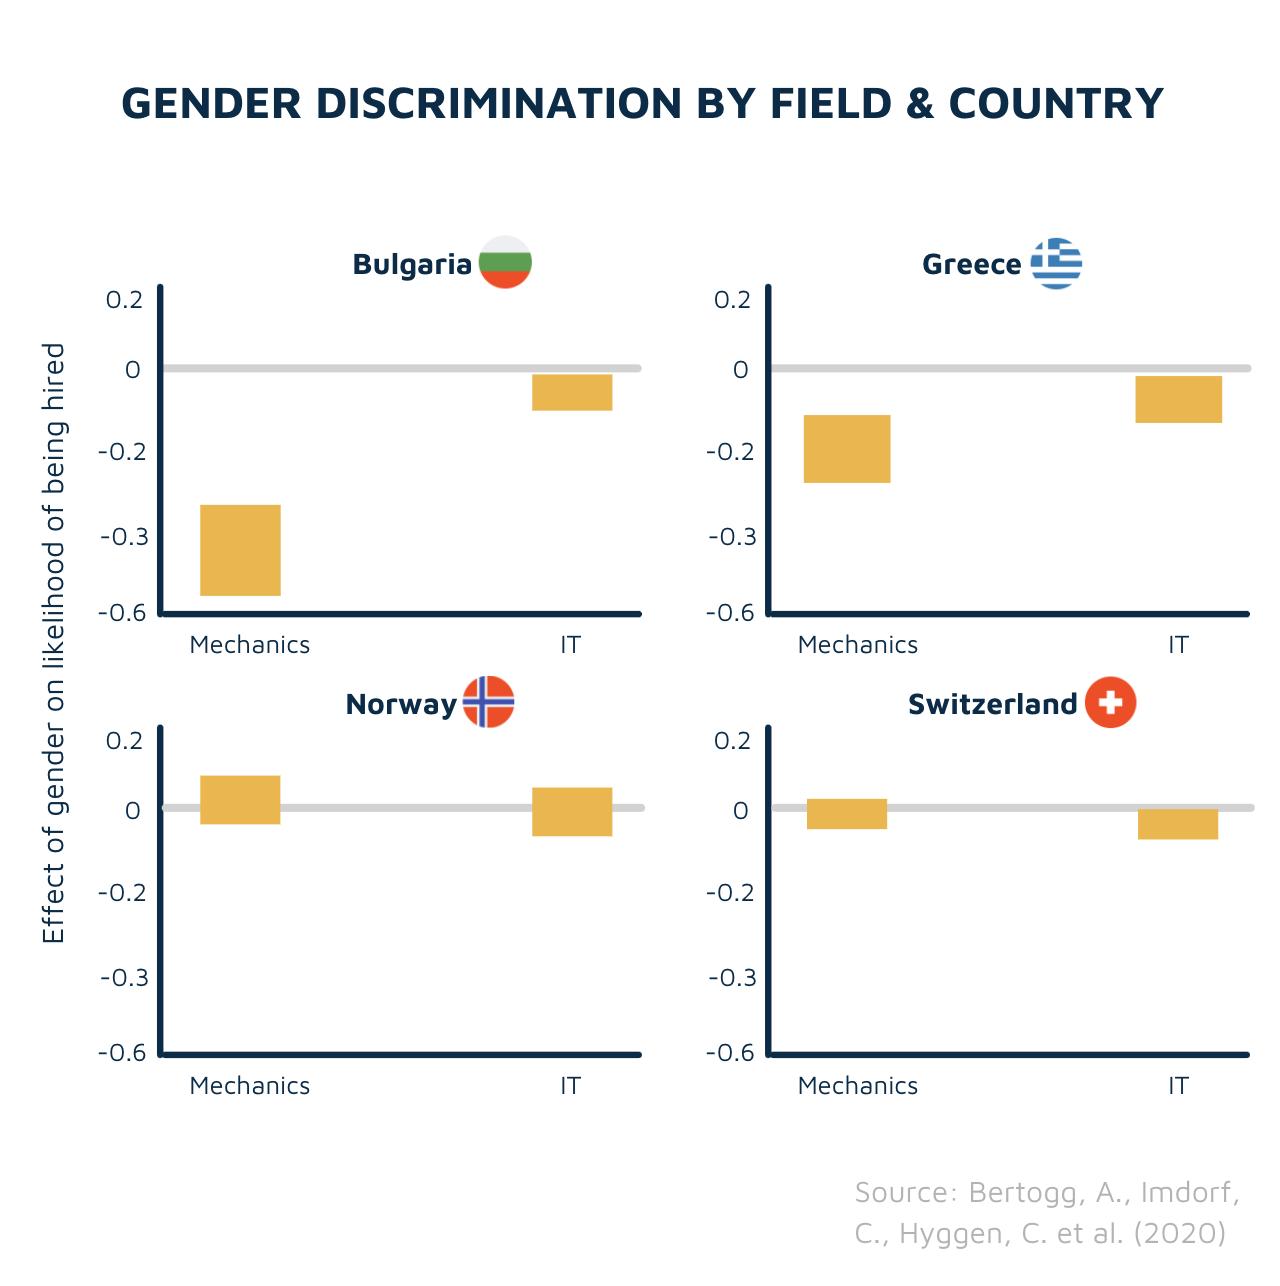 Gender discrimination across EU